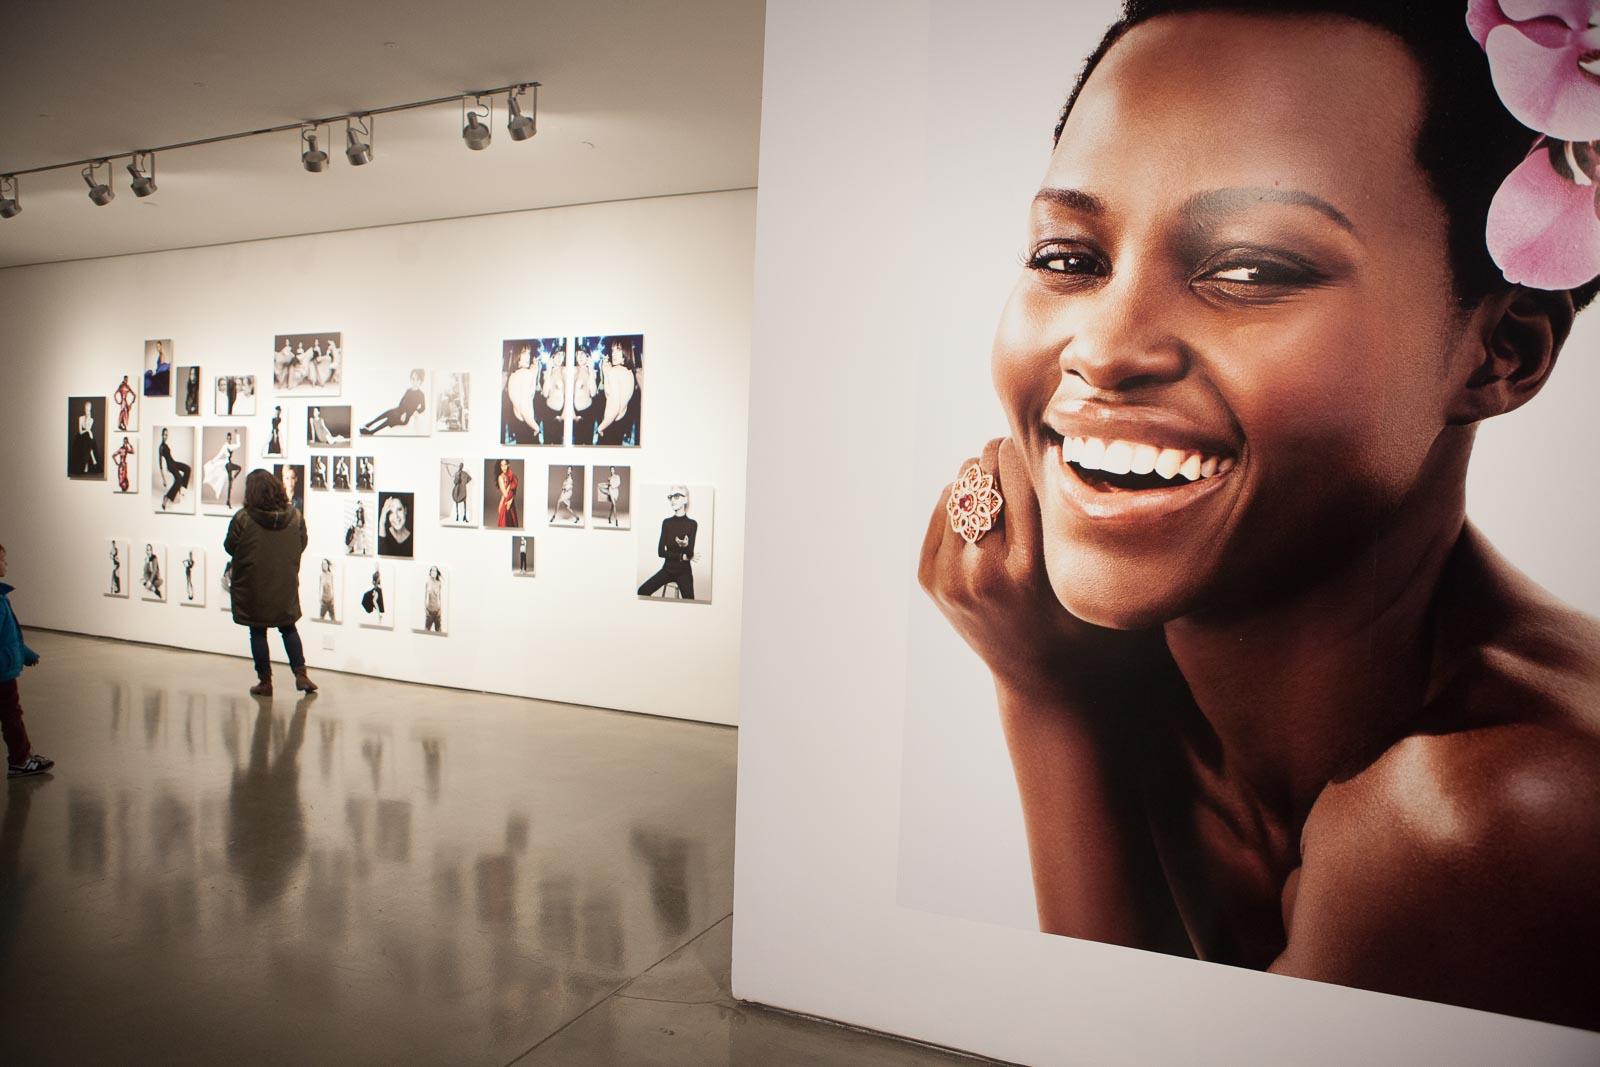 alexi-lubomirski-diverse-beauty-exhibition-robertiaga-7